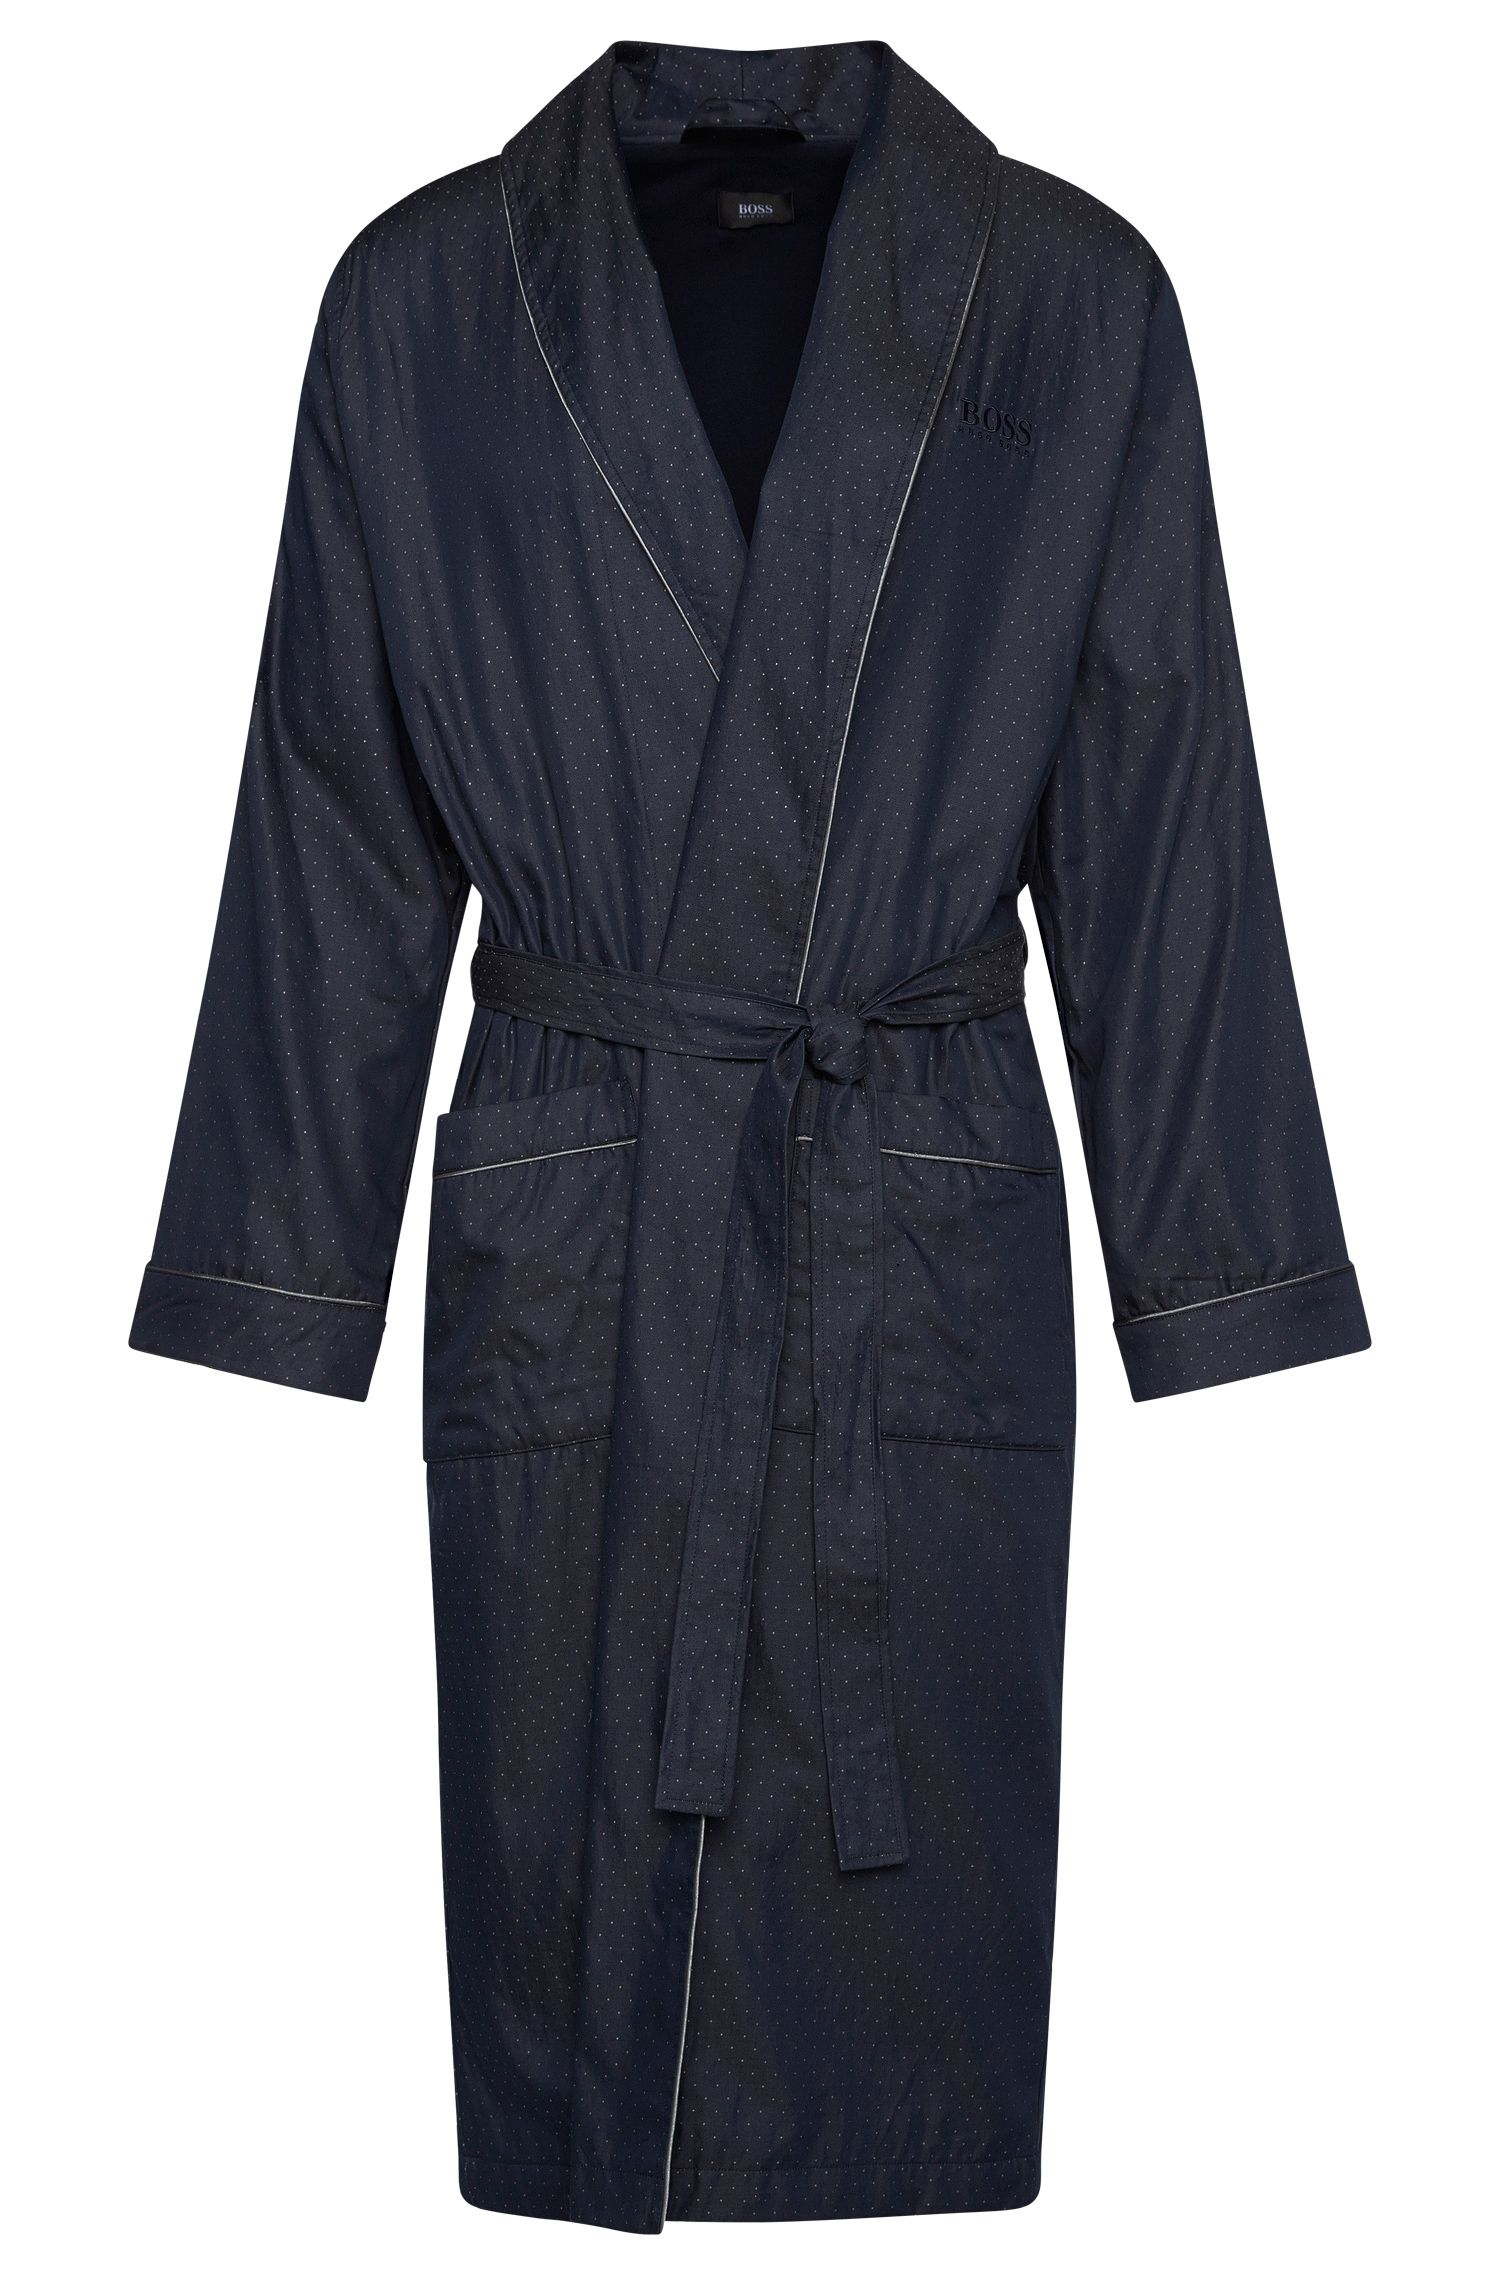 Cotton Belted Robe | Shawl Collar Robe